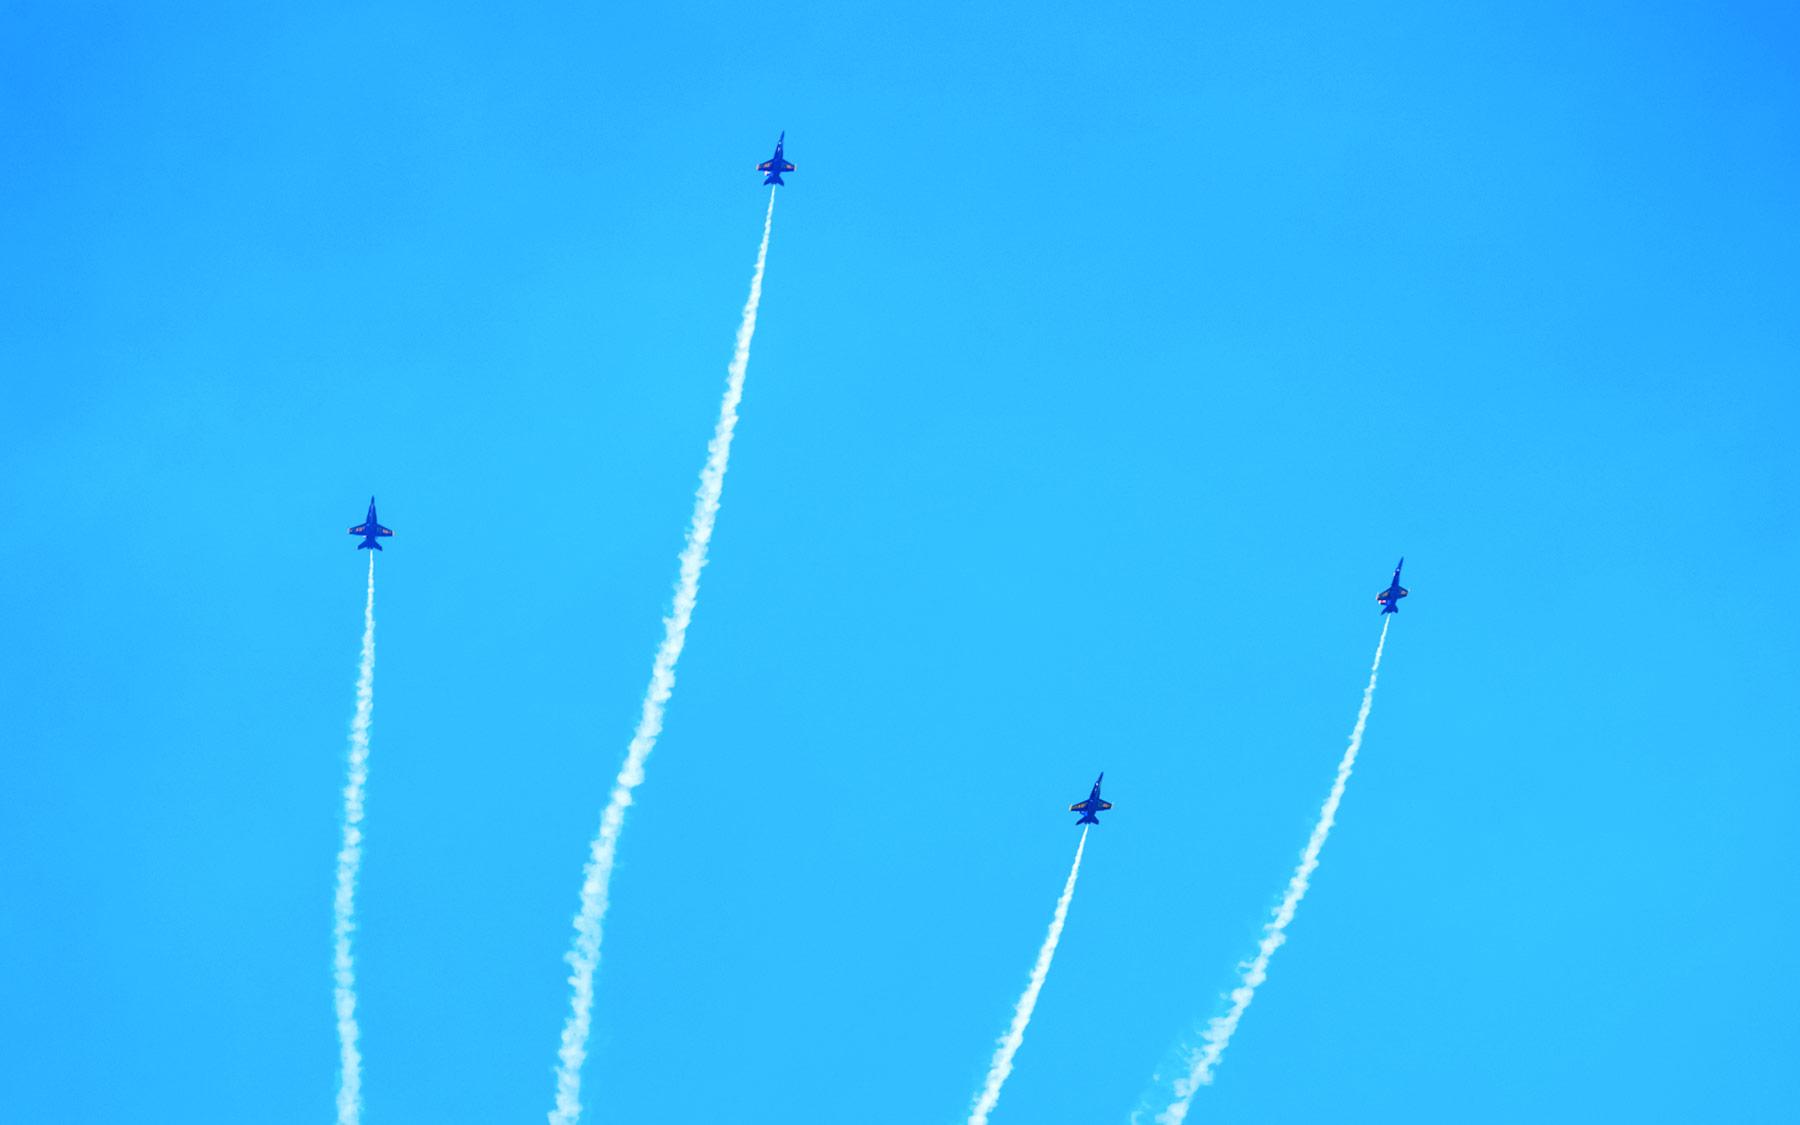 Blue-Angels-23-Blue-Angels-22-six-smokin-break-alt